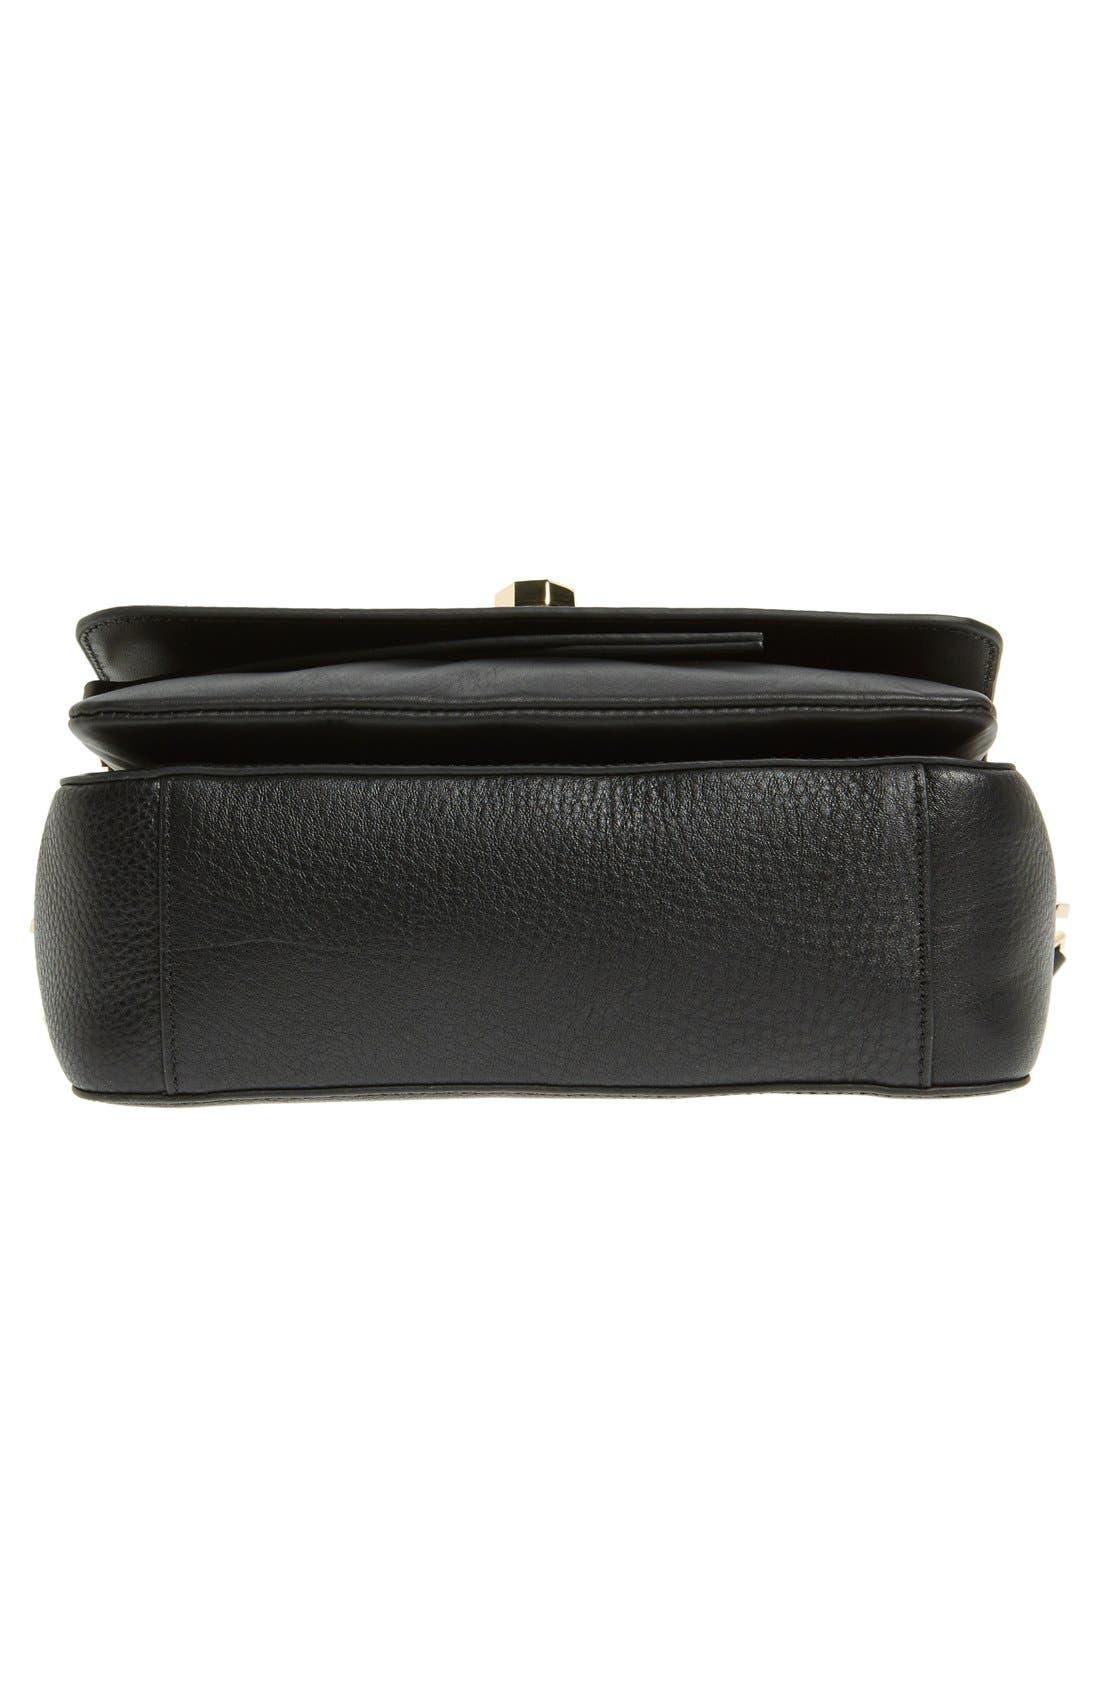 'Small Alis' Leather Crossbody Bag,                             Alternate thumbnail 5, color,                             001